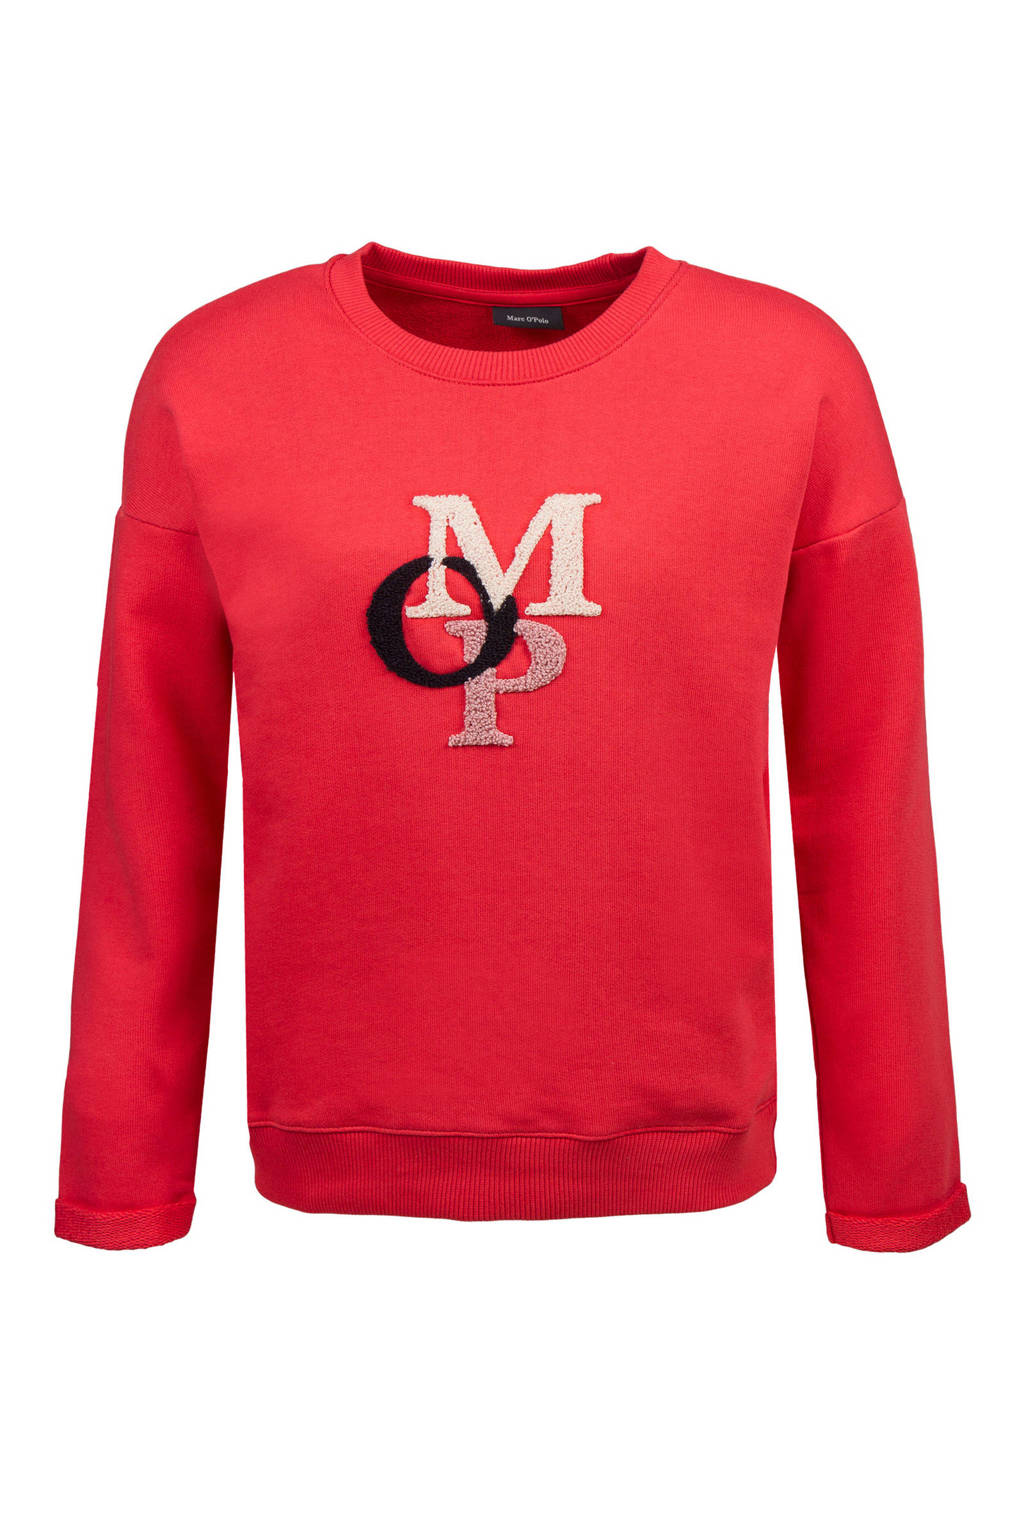 Marc O'Polo sweater met logo rood, Rood